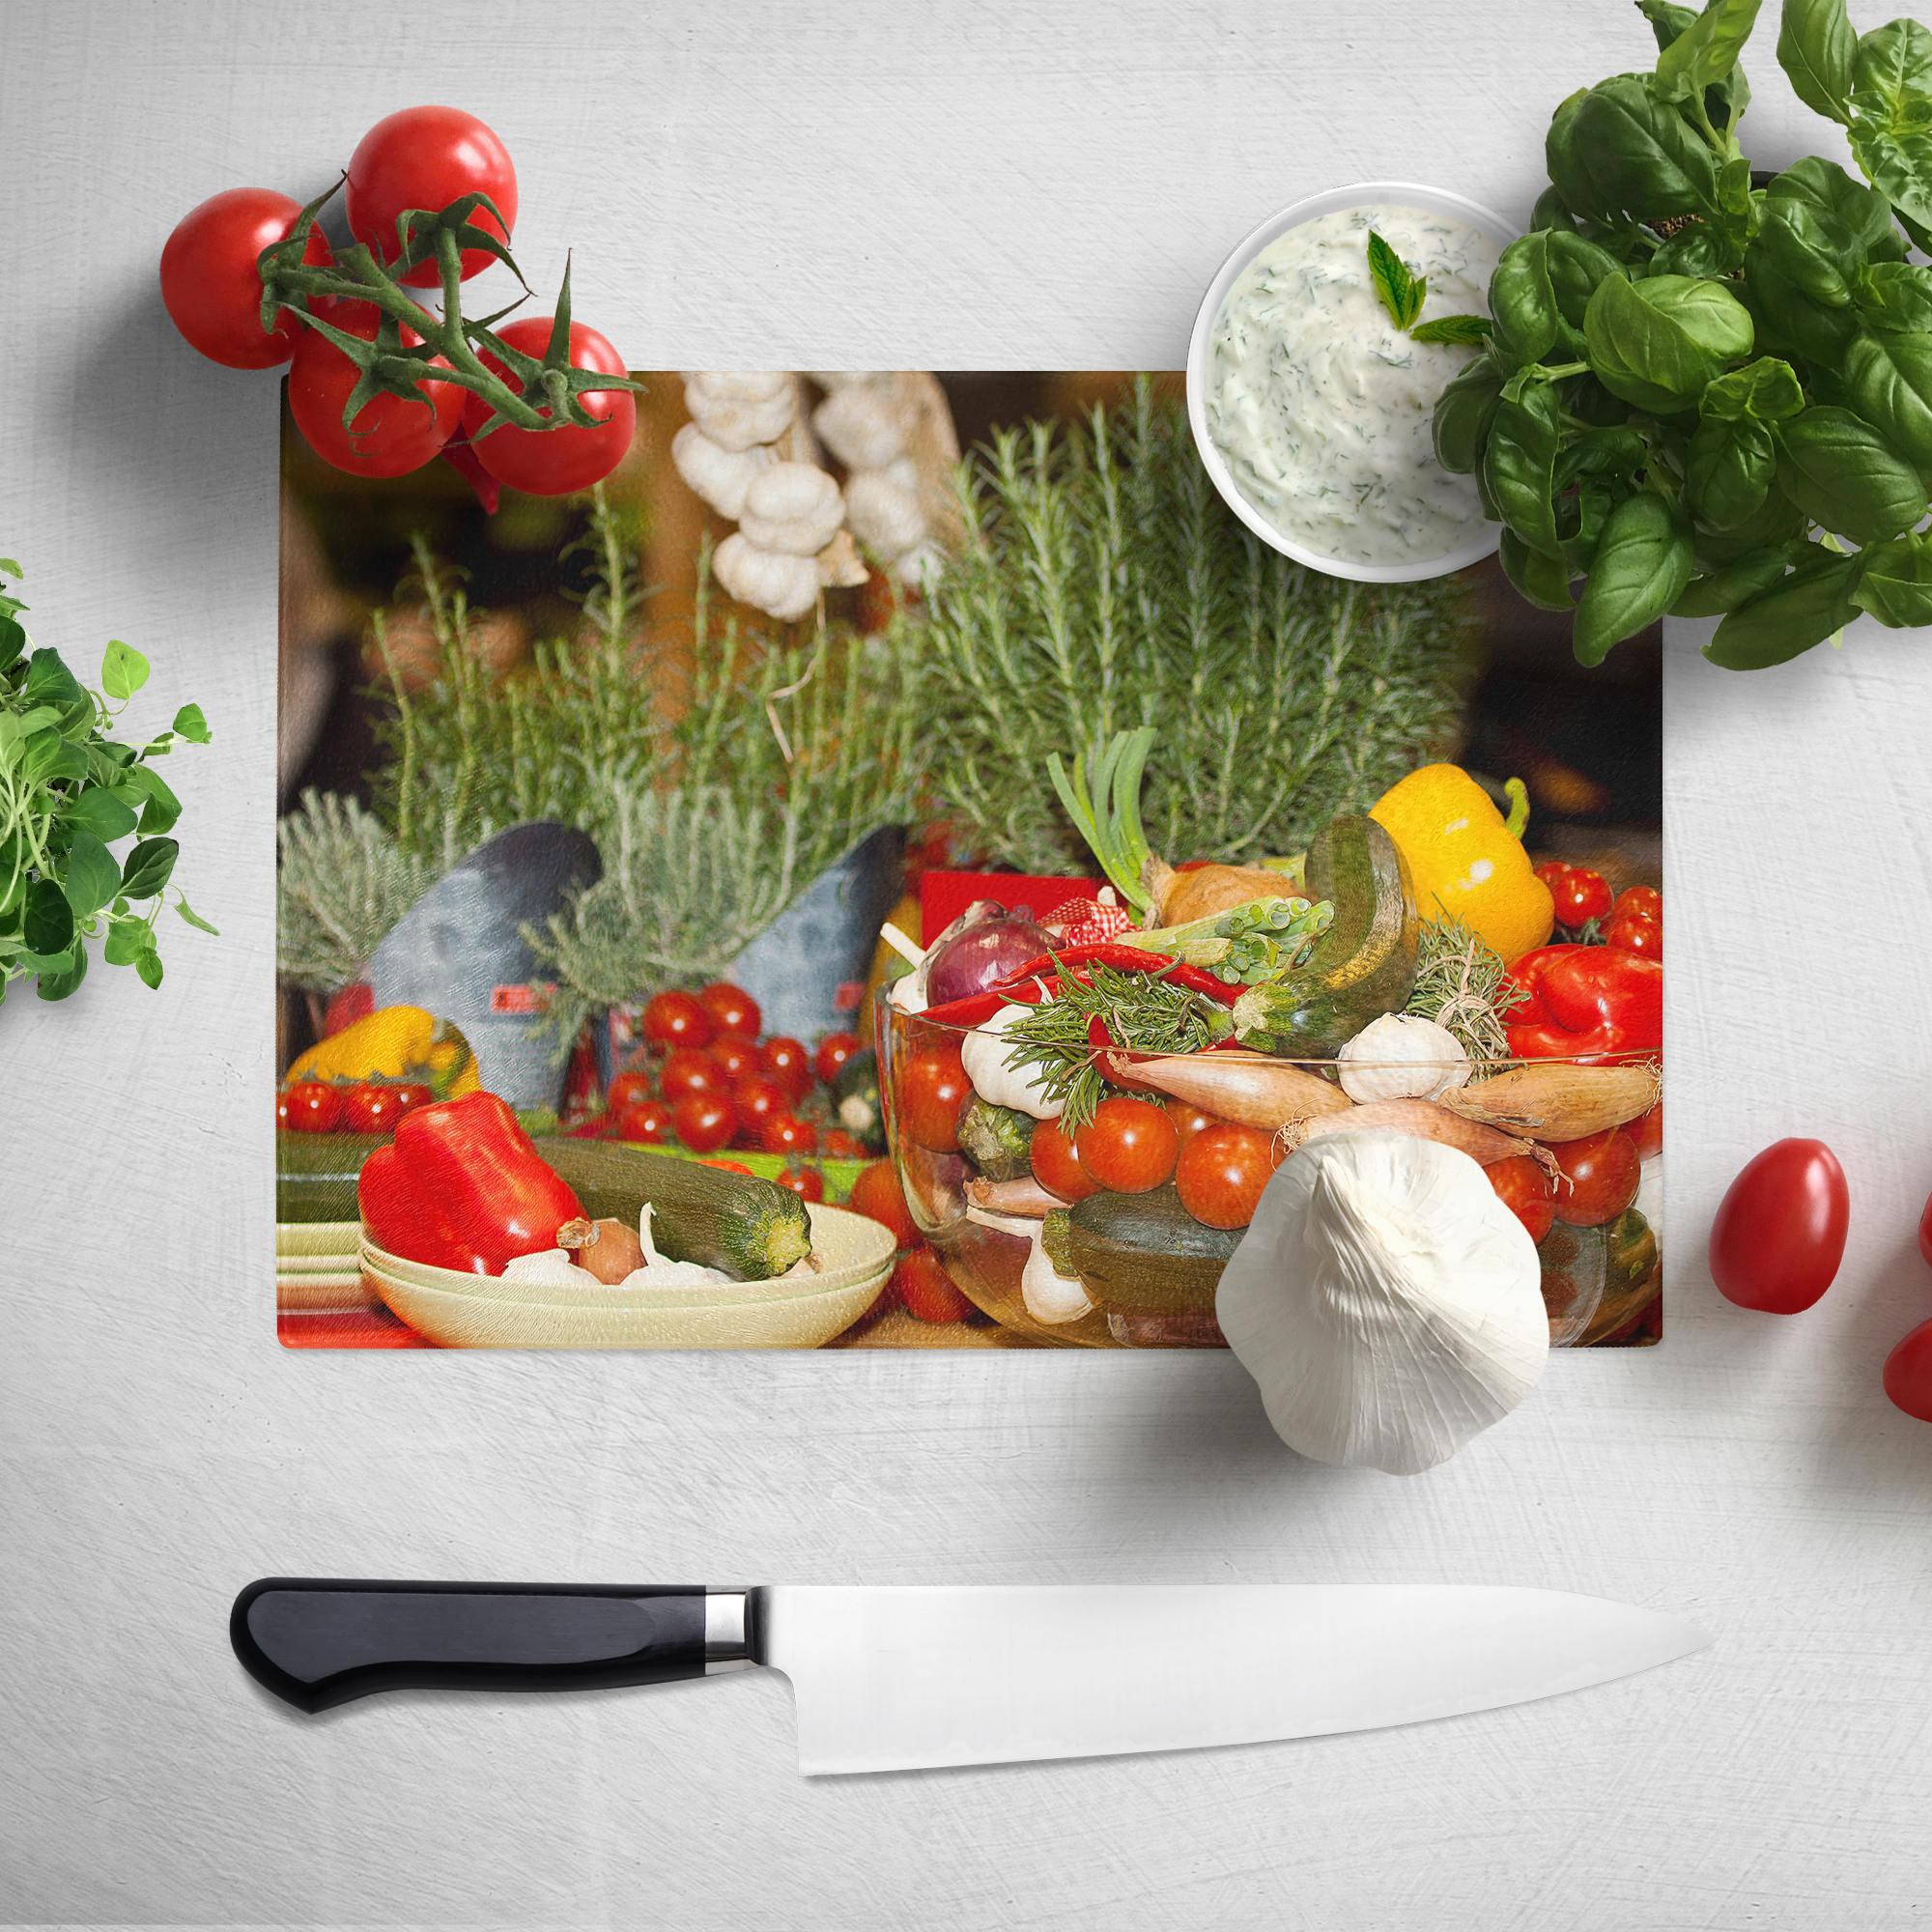 Cutting Board //Counter Saver // Chopping Board Large 28.5cm x 39cm Sugar Skull